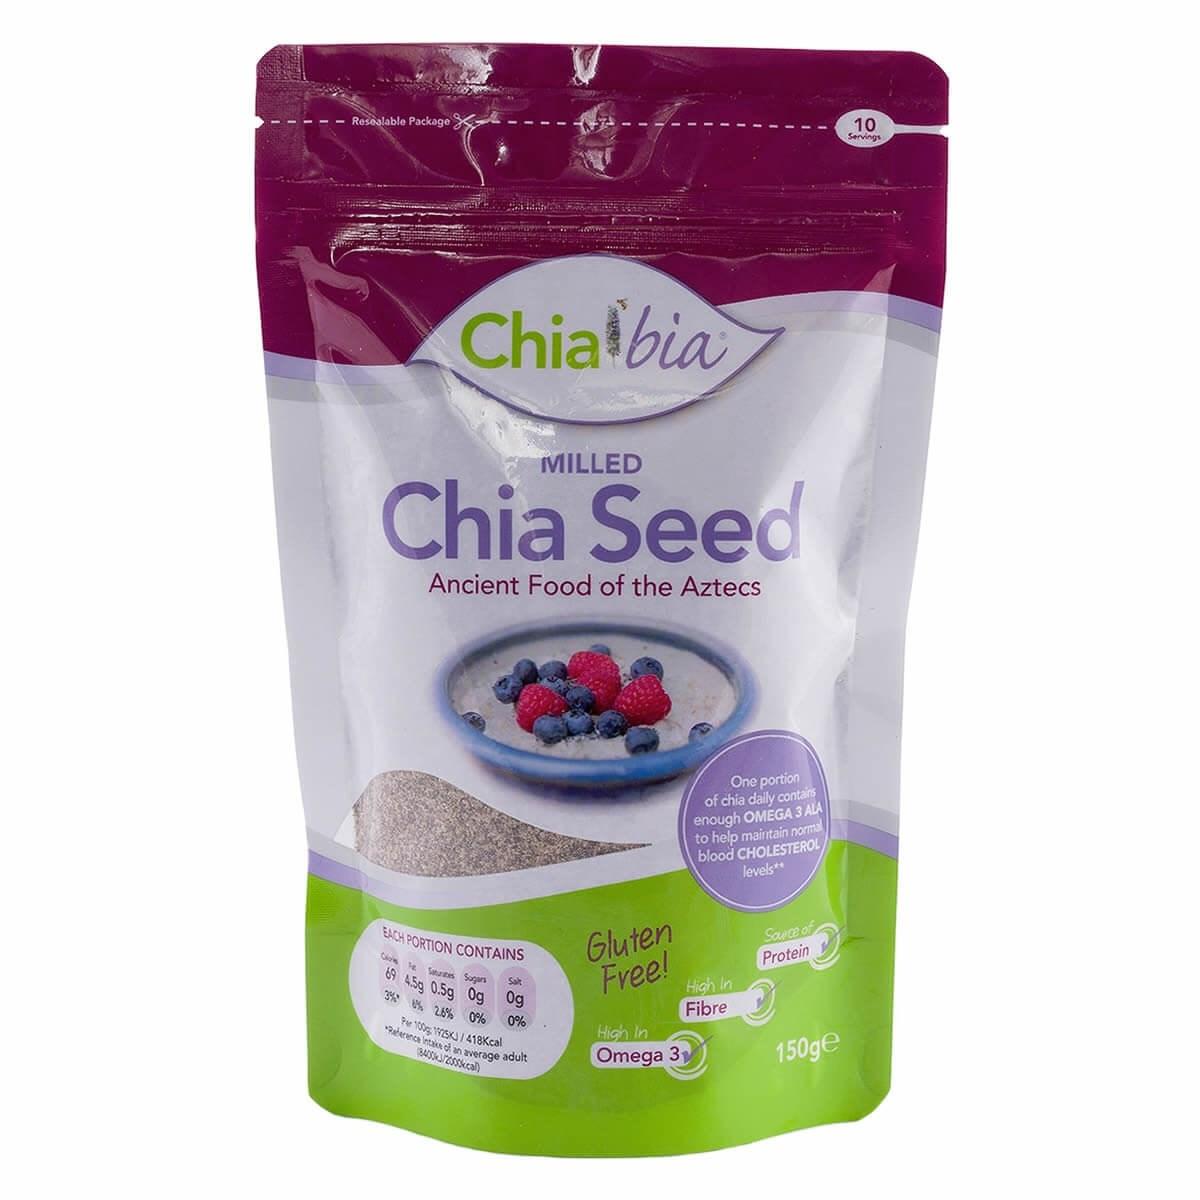 Chia Bia Milled Chia Seed 150g